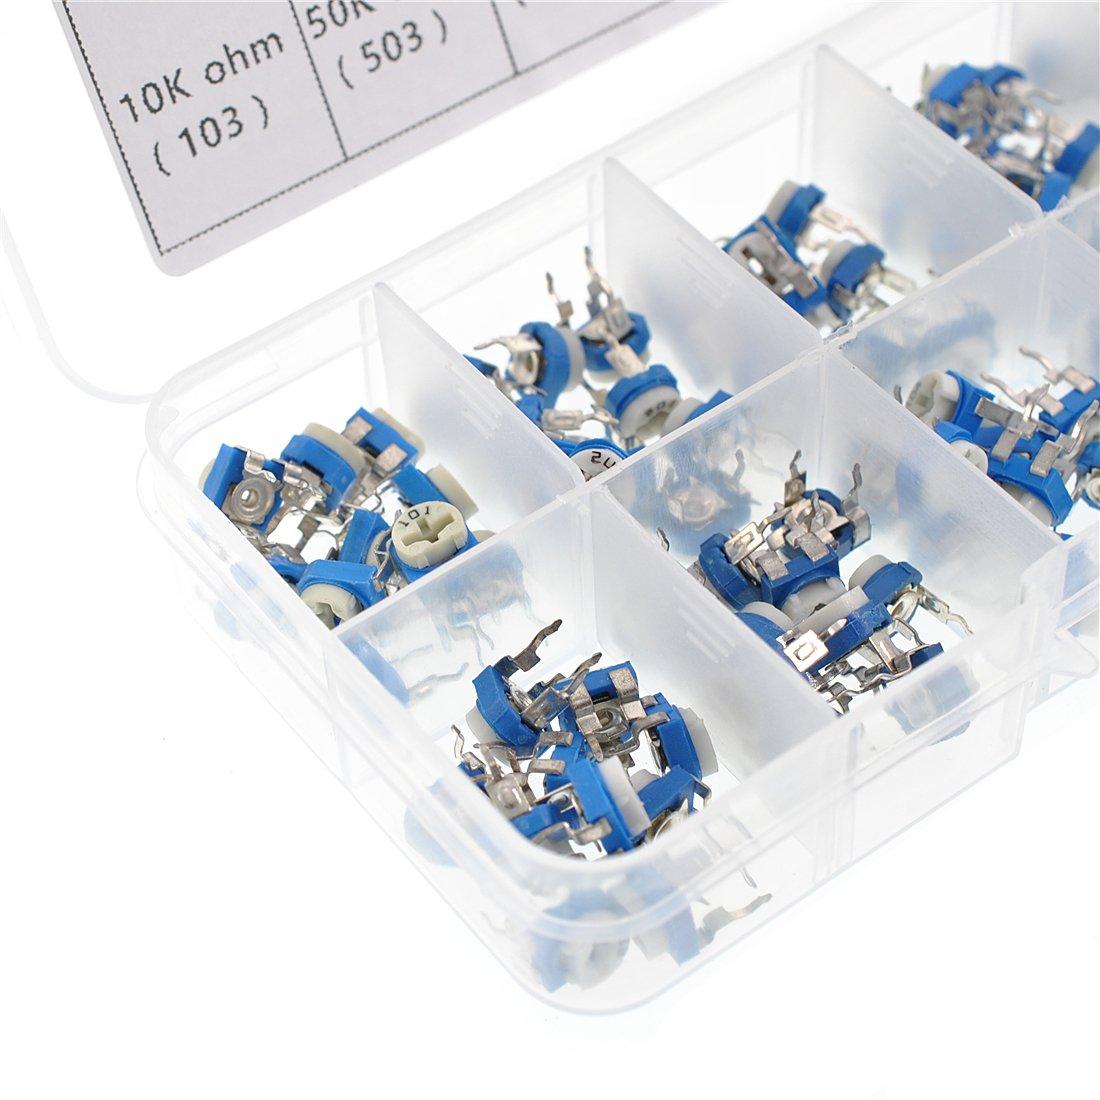 Oiyagai 10 Value 100pcs Variable Resistor Assorted Kit